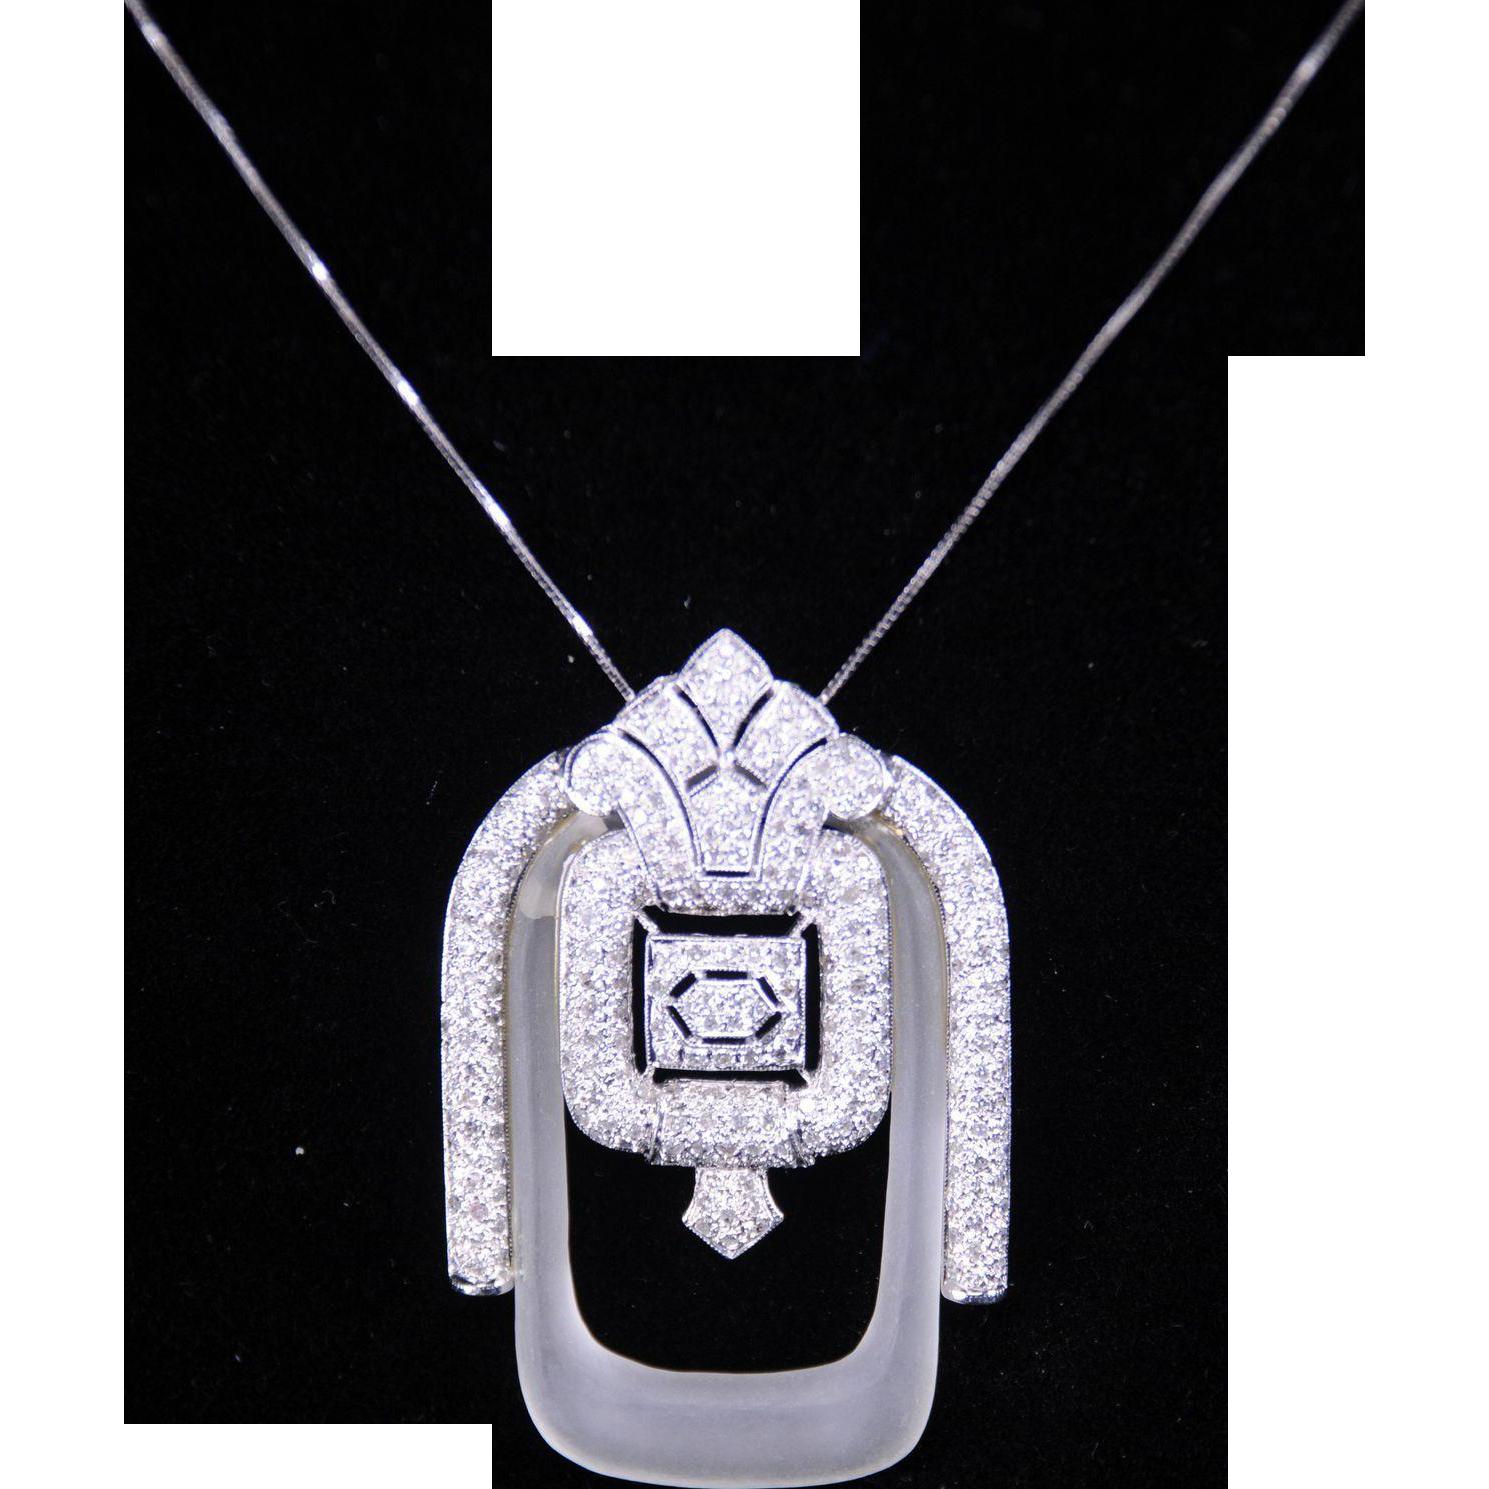 Fabulous Art Deco Style Pendant with 1.50 Carats of Diamonds